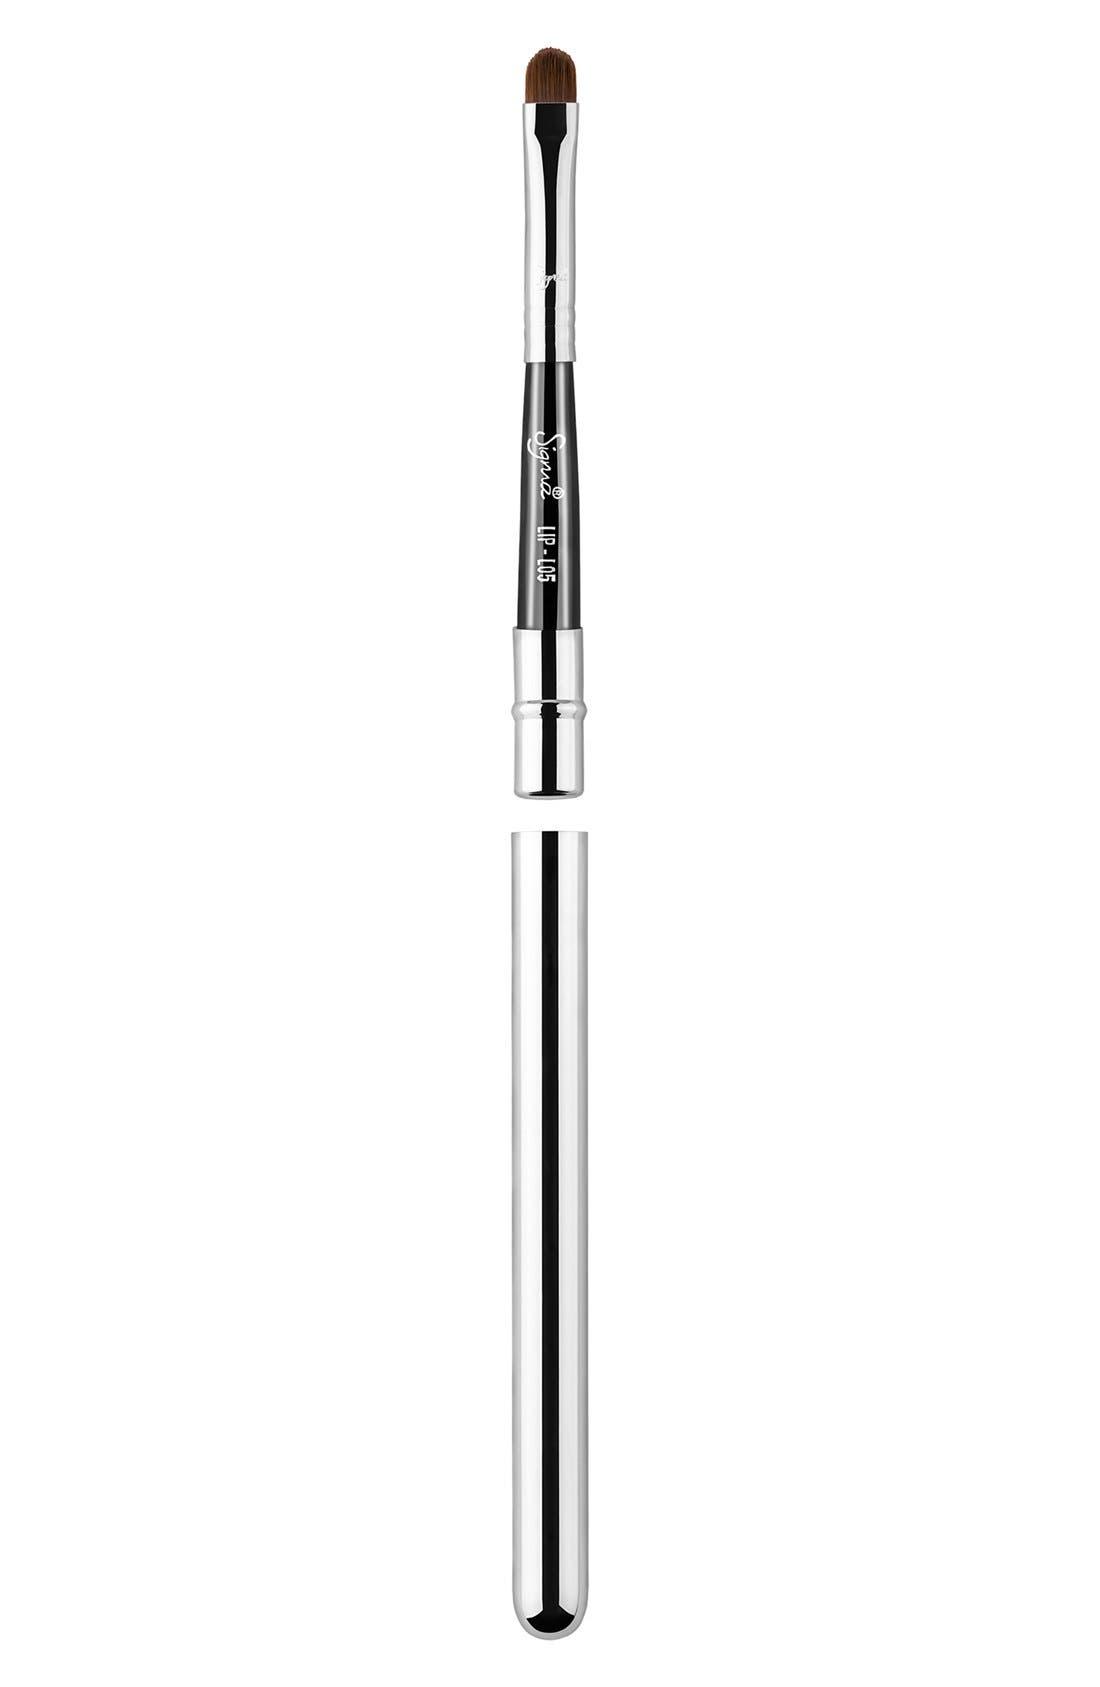 L05 Lip Brush,                             Main thumbnail 1, color,                             NO COLOR